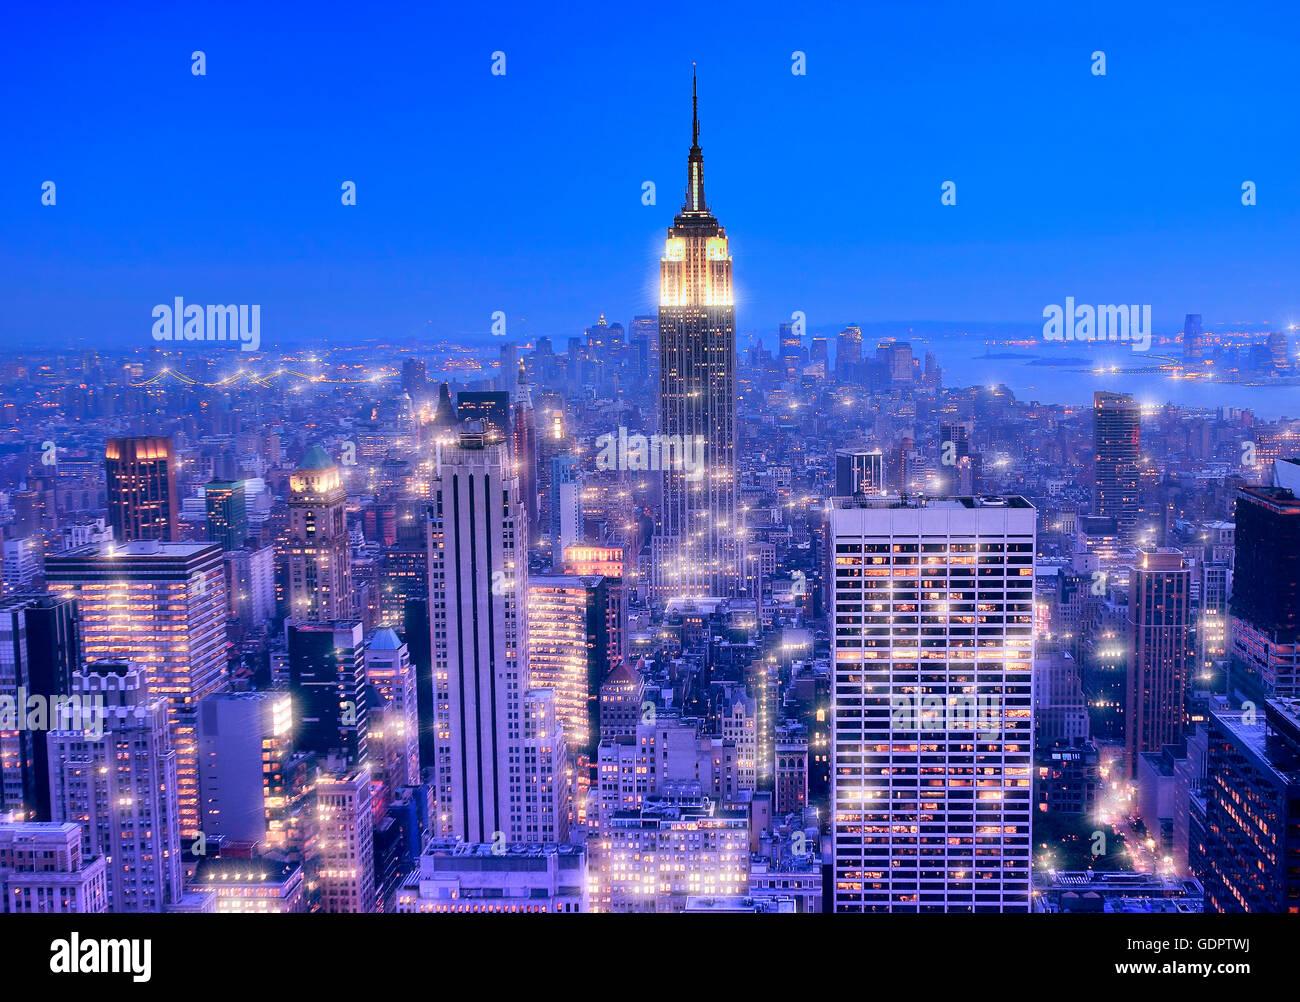 Skyline di Manhattan di notte nella città di New York Immagini Stock